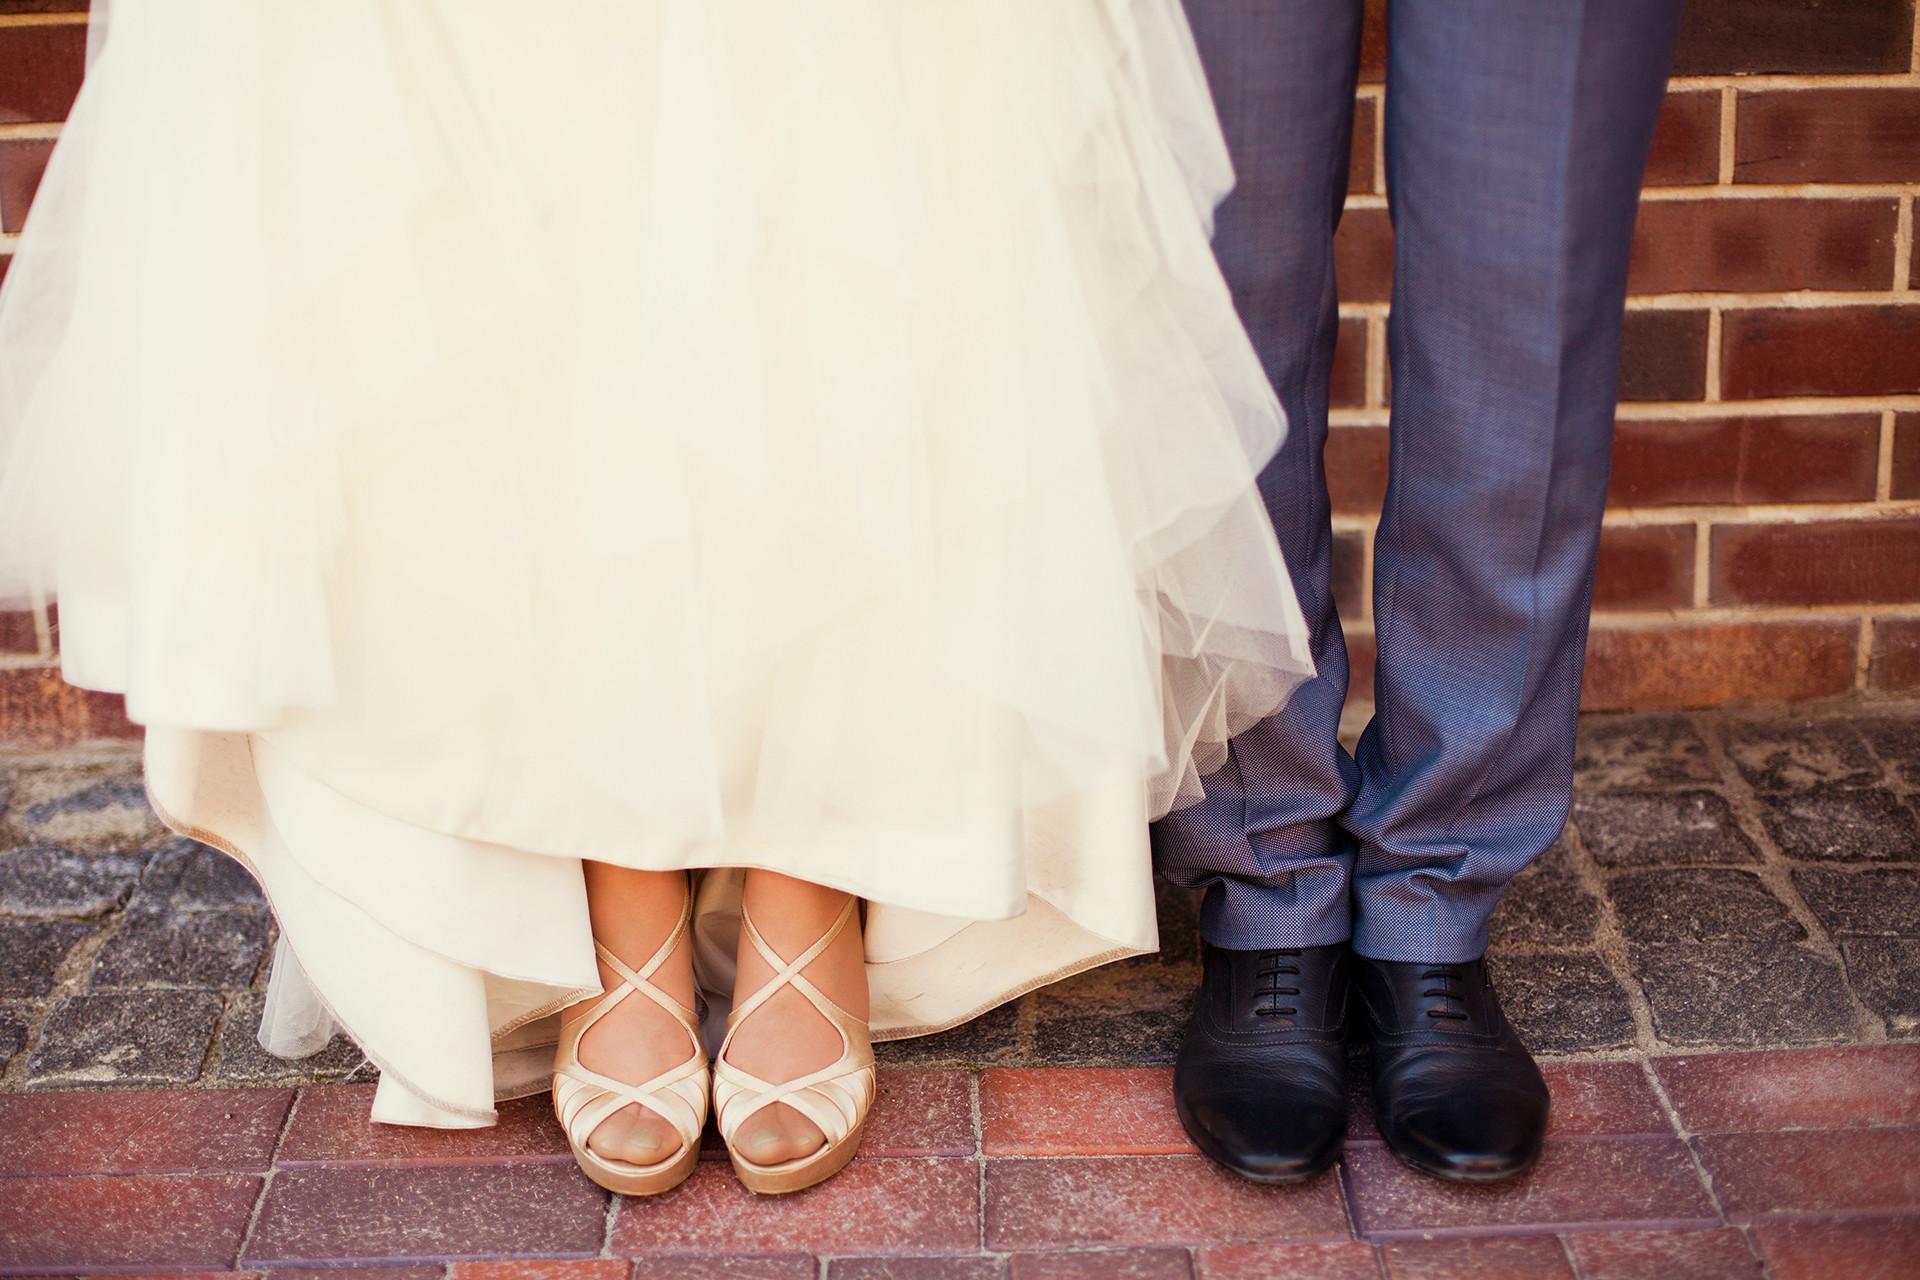 Free Consultation - Wedding